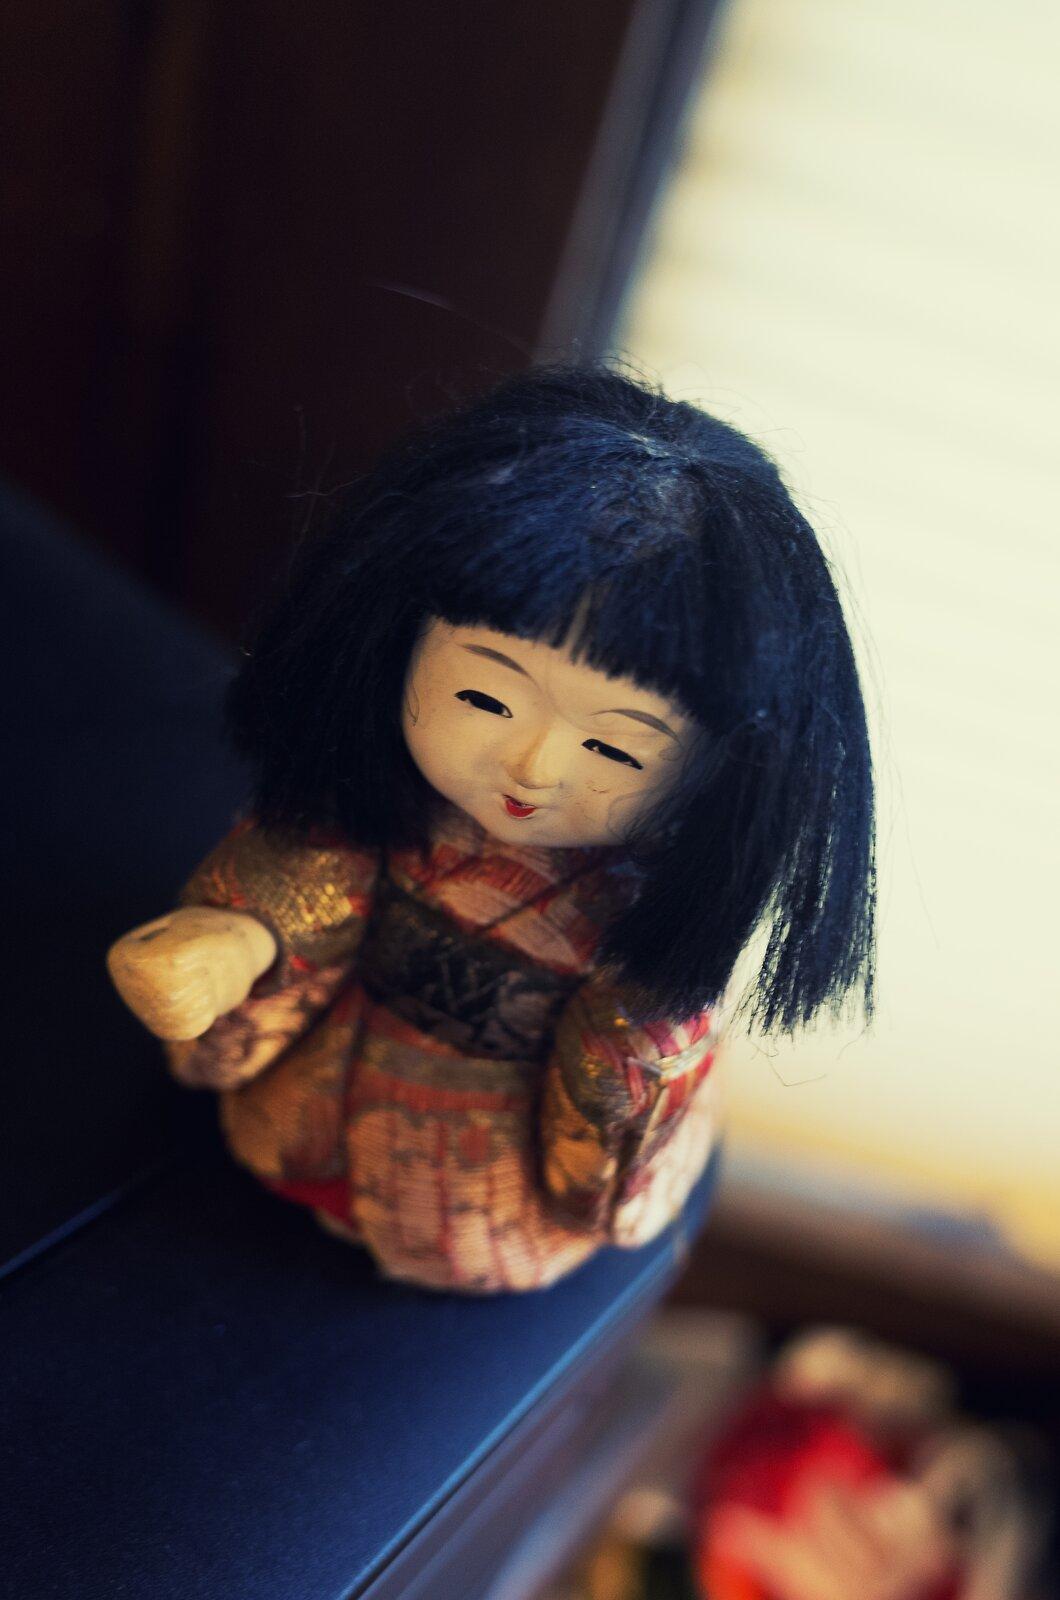 GRII_July7_Japanese_Doll#3(ColorEfexXP).jpg